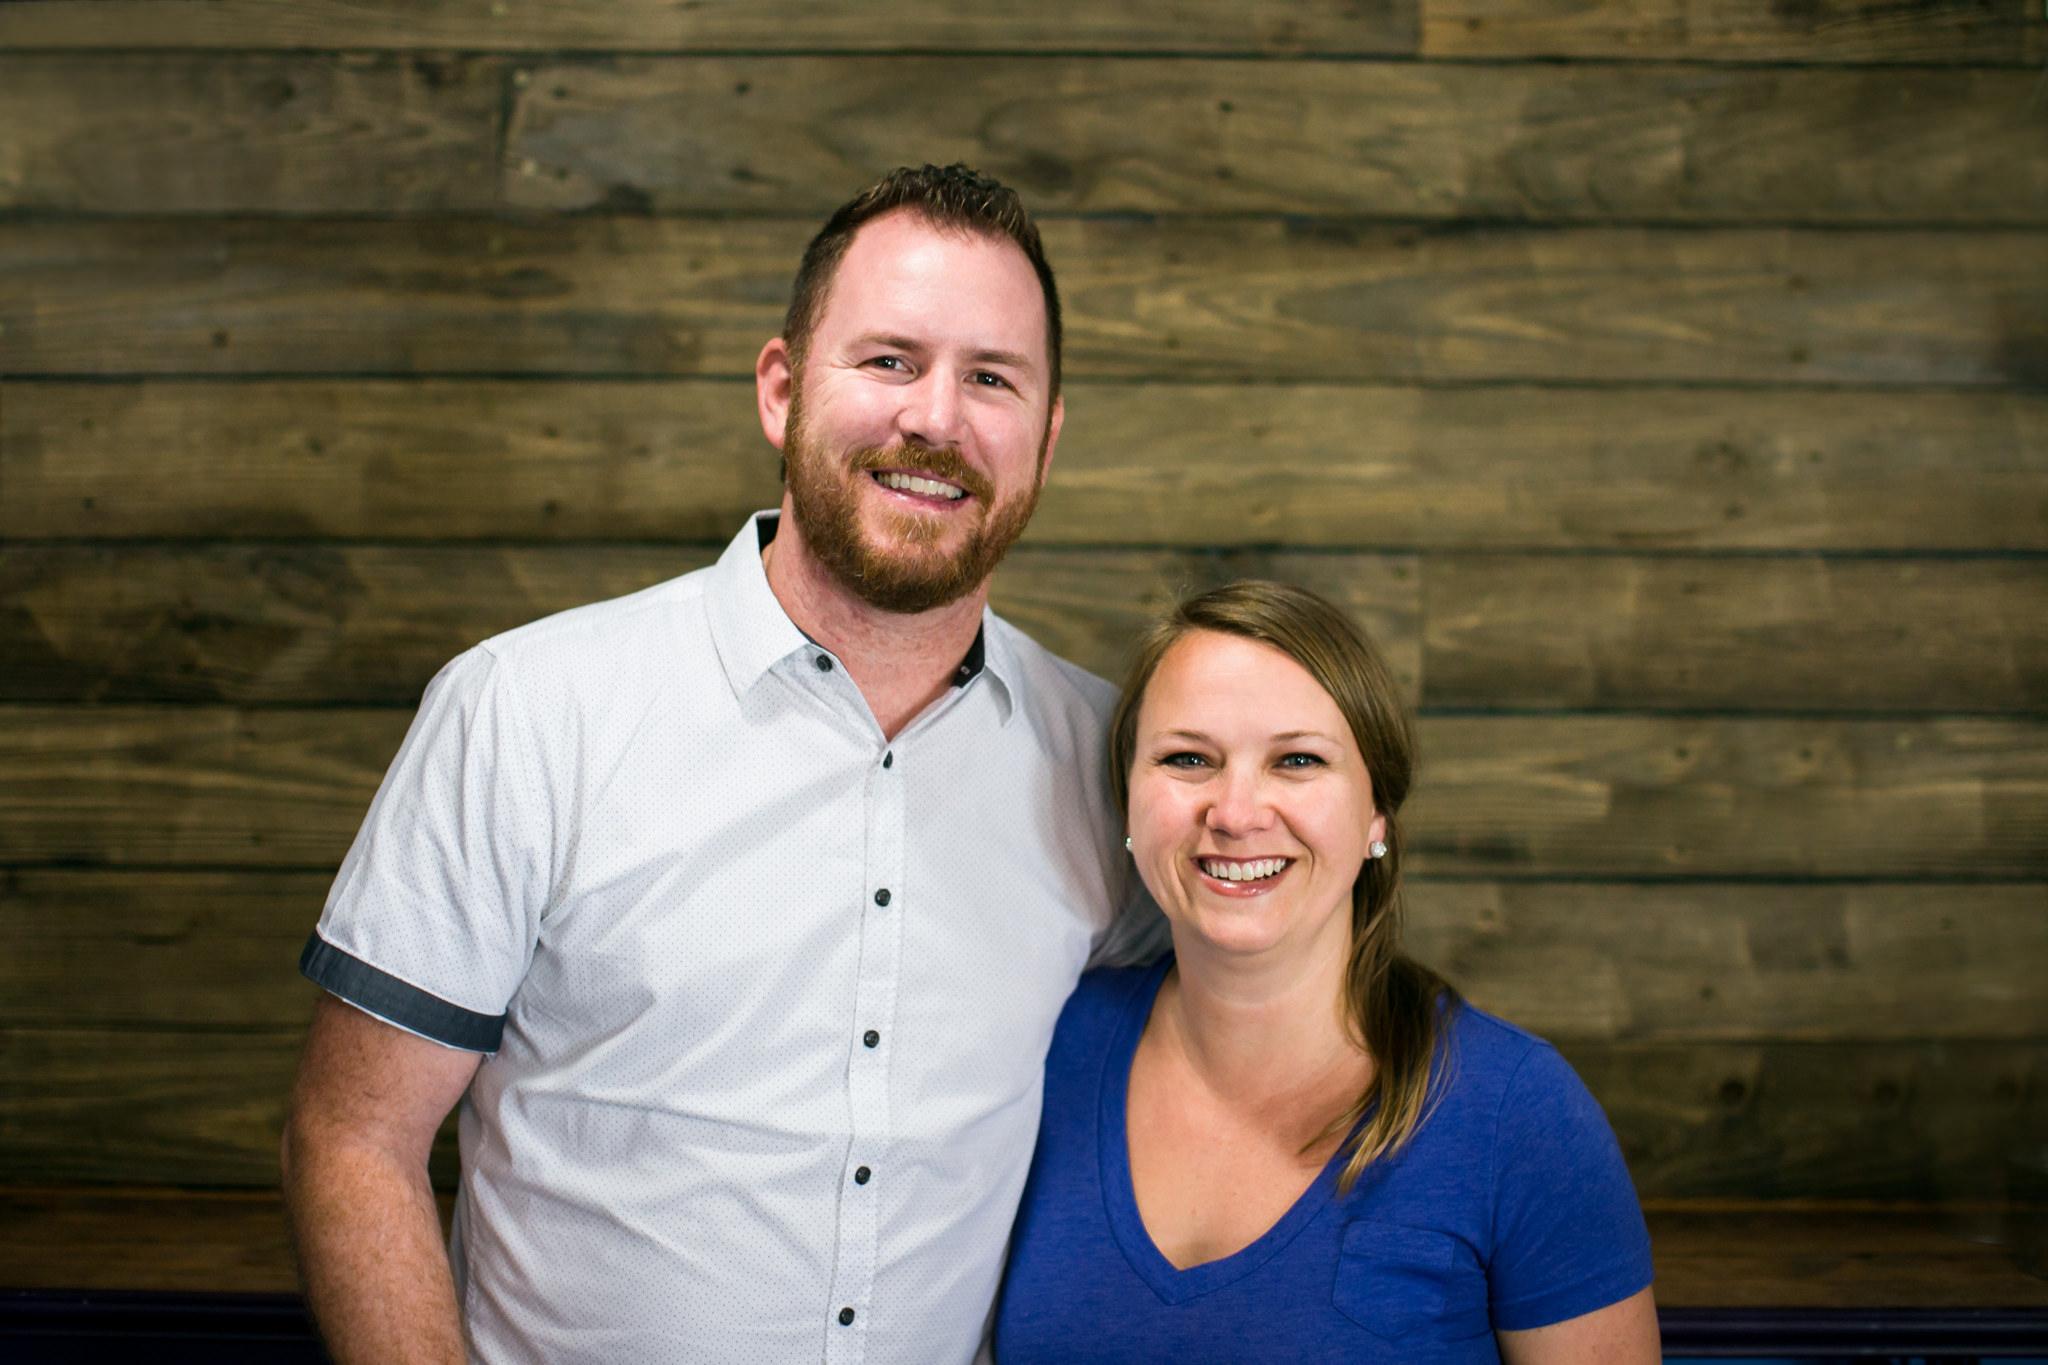 Pastors Jeremy and Kimi Copeland